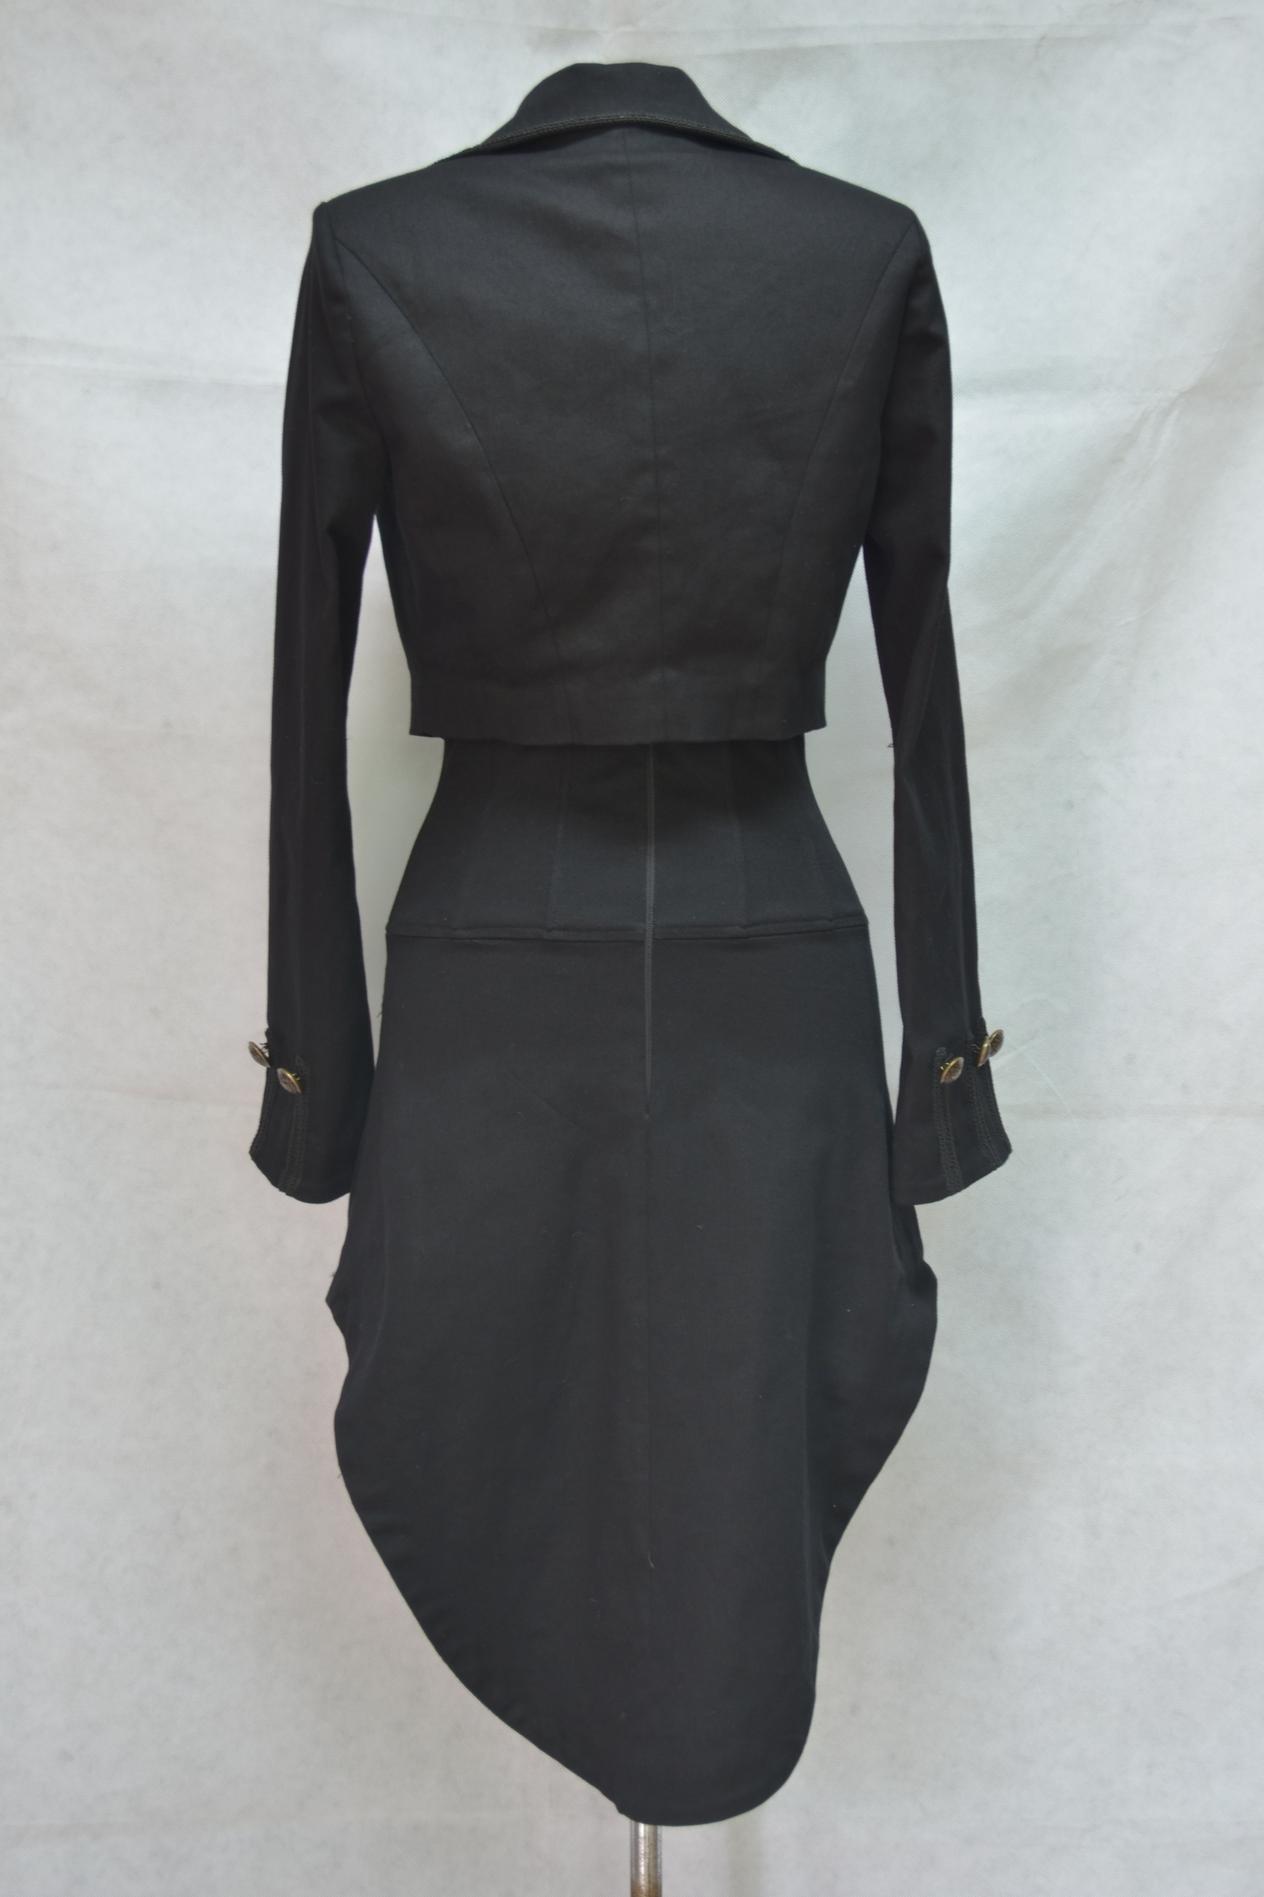 alternative_black_gothic_two_piece_for_women_jackets_4.jpg